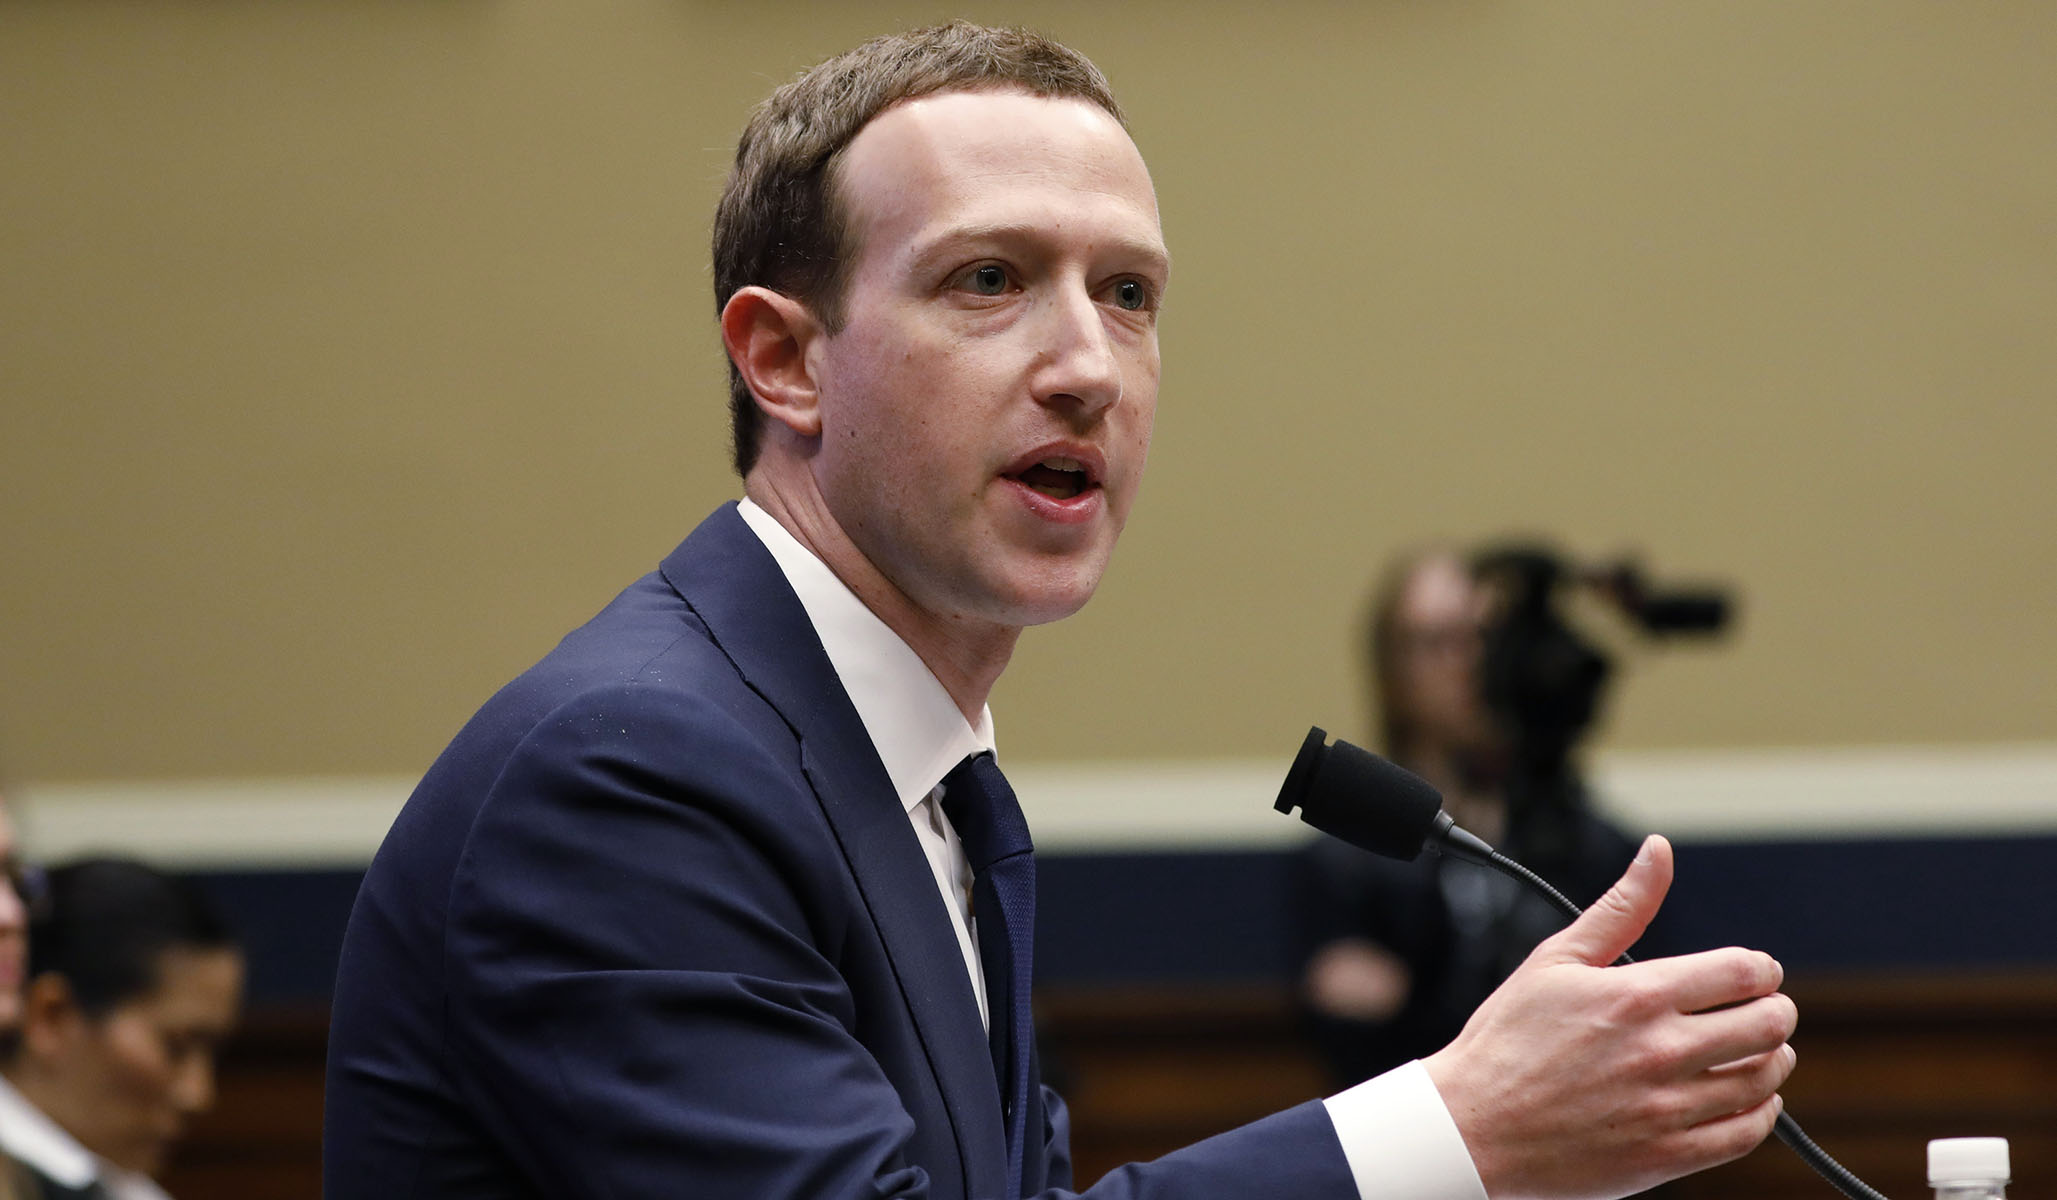 Zuckerberg Calls Elizabeth Warren an 'Existential' Threat to Facebook in Leaked Audio